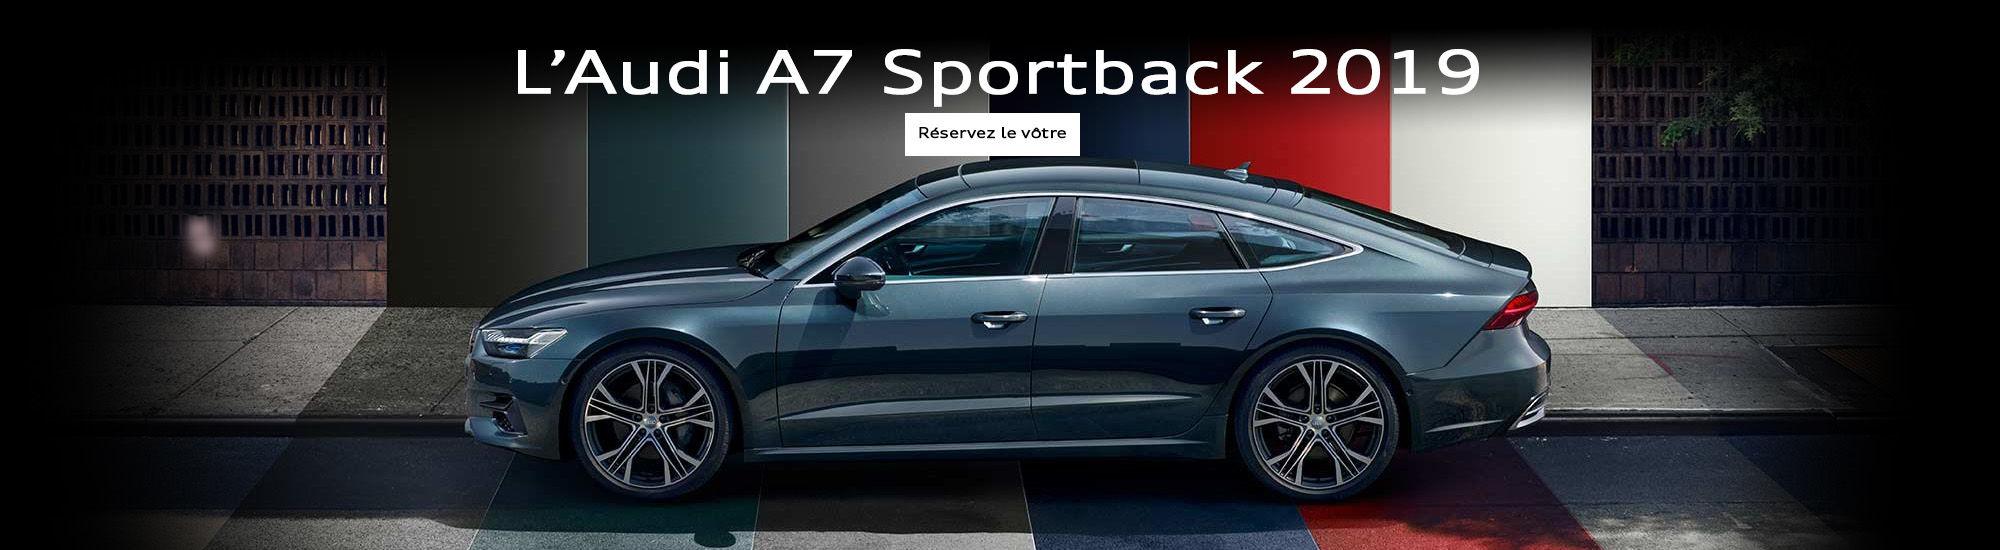 L'Audi A7 sportback 2019